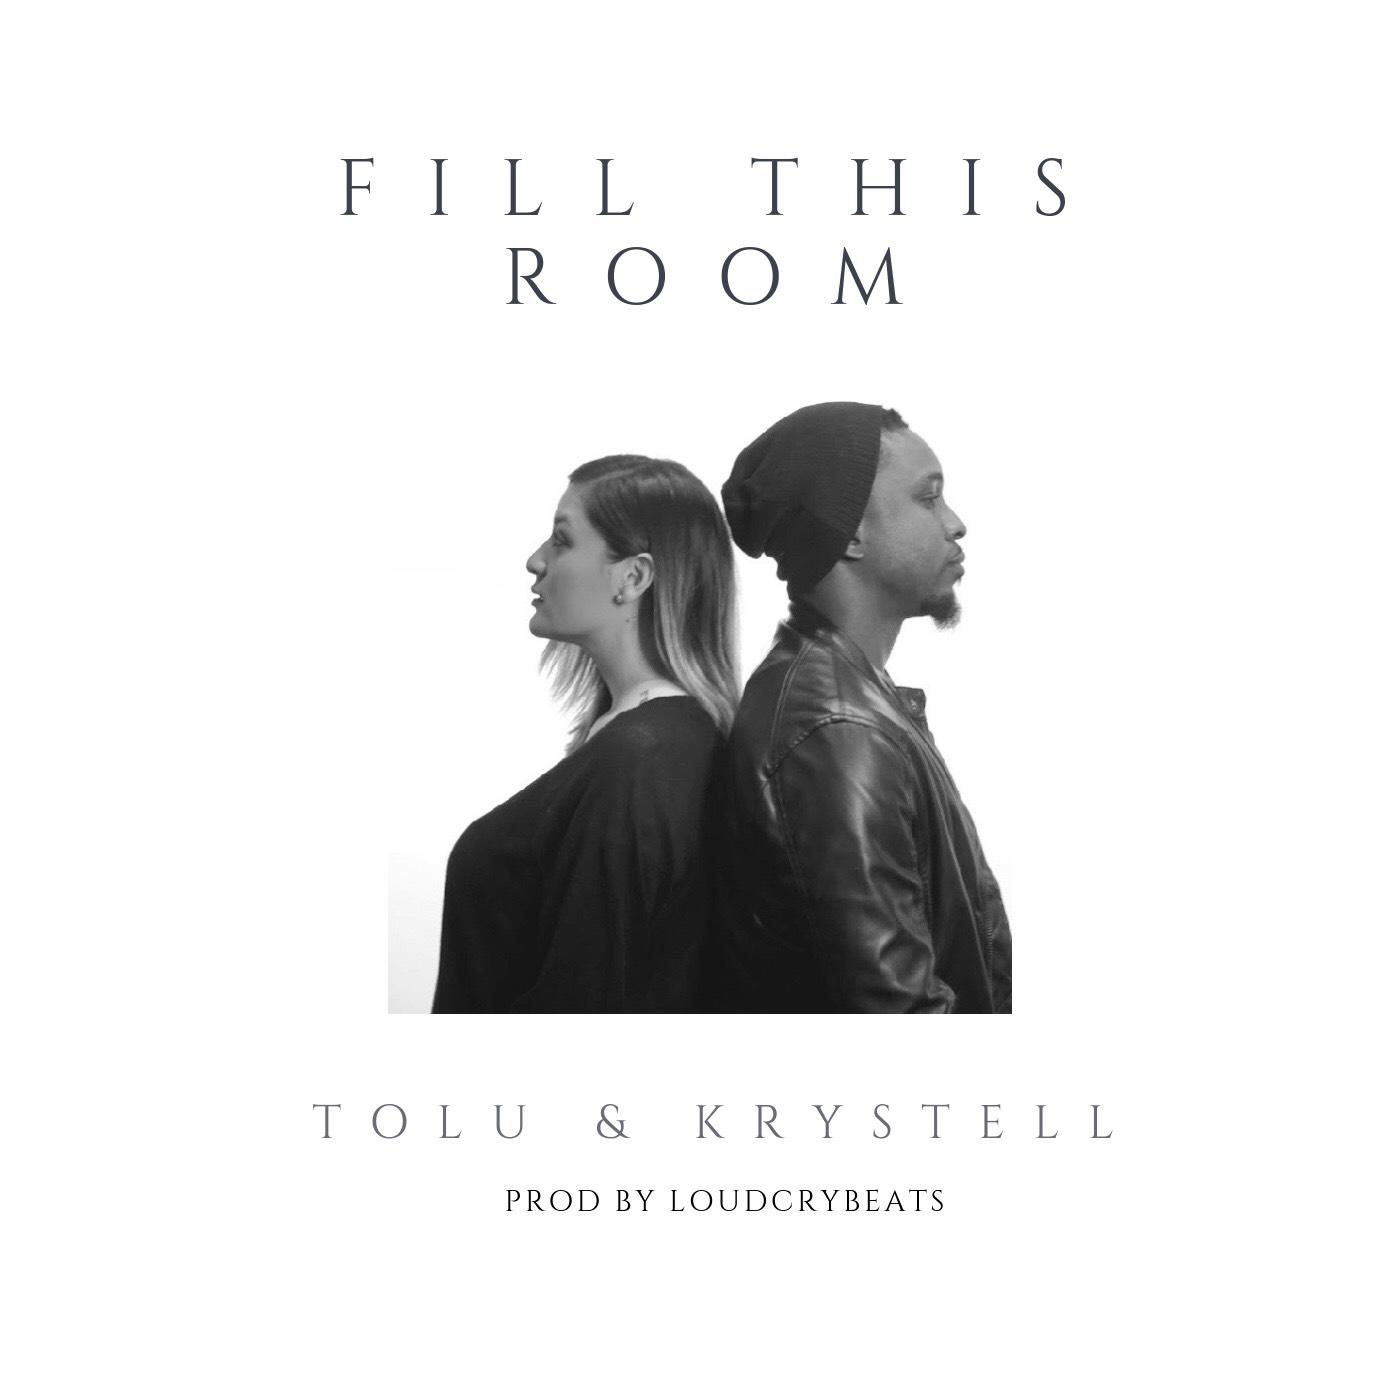 Tolu & Krystell - Fill This Room